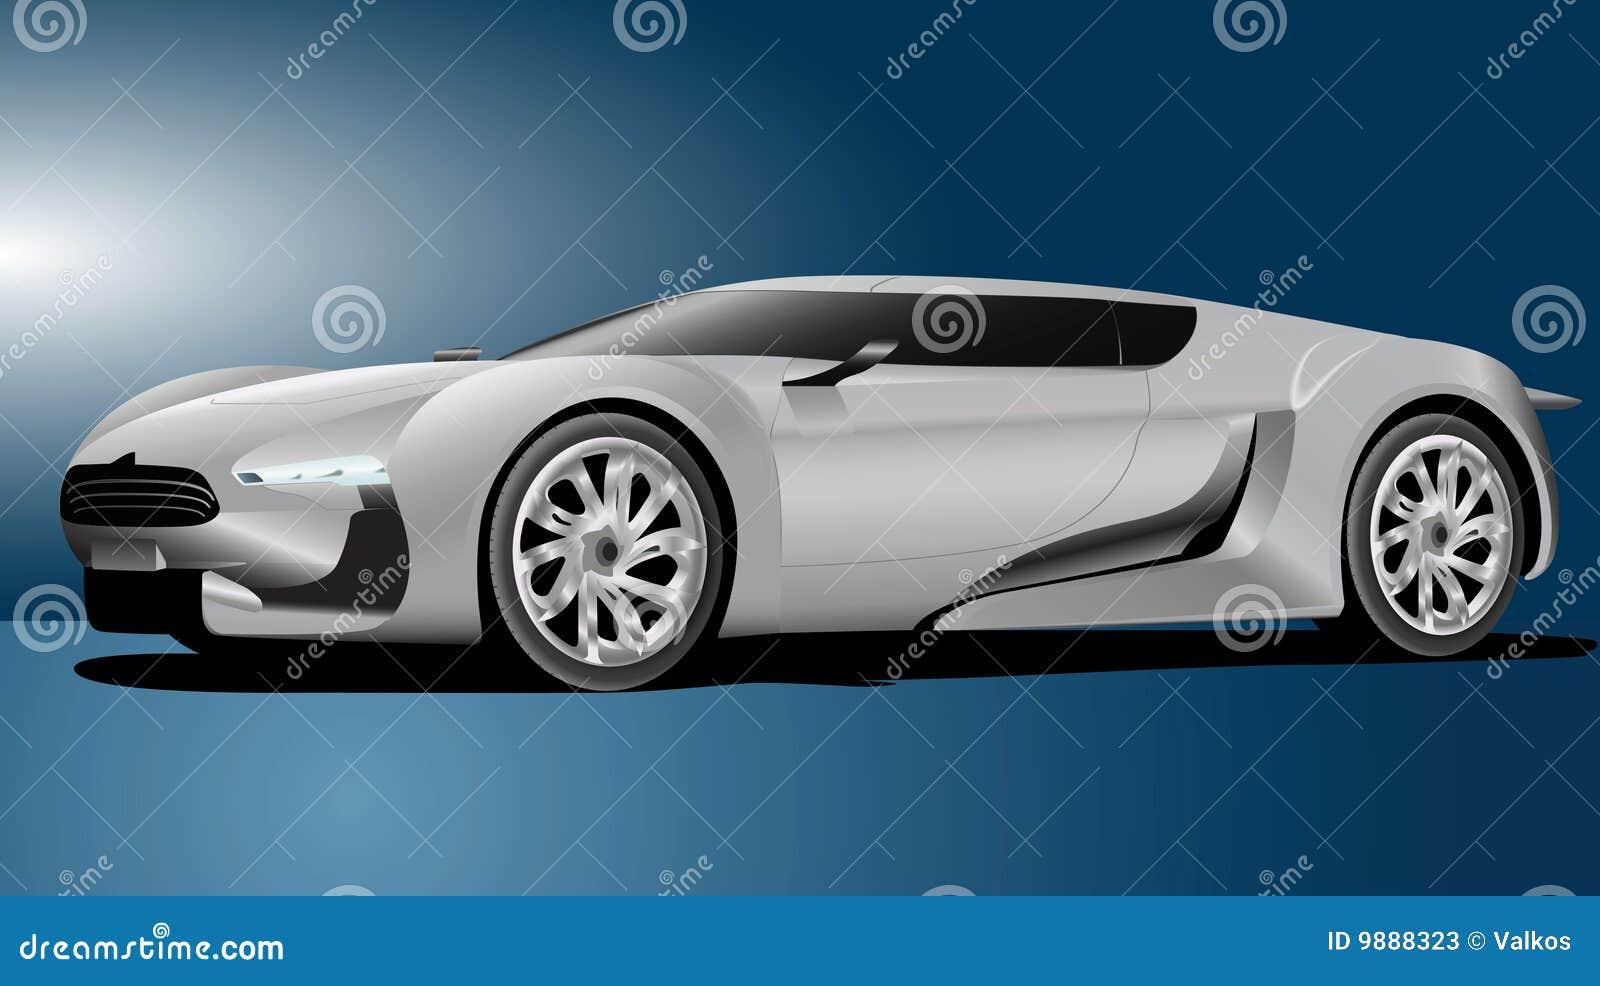 A Small Car >> Elegant Car Pictures - Car Canyon